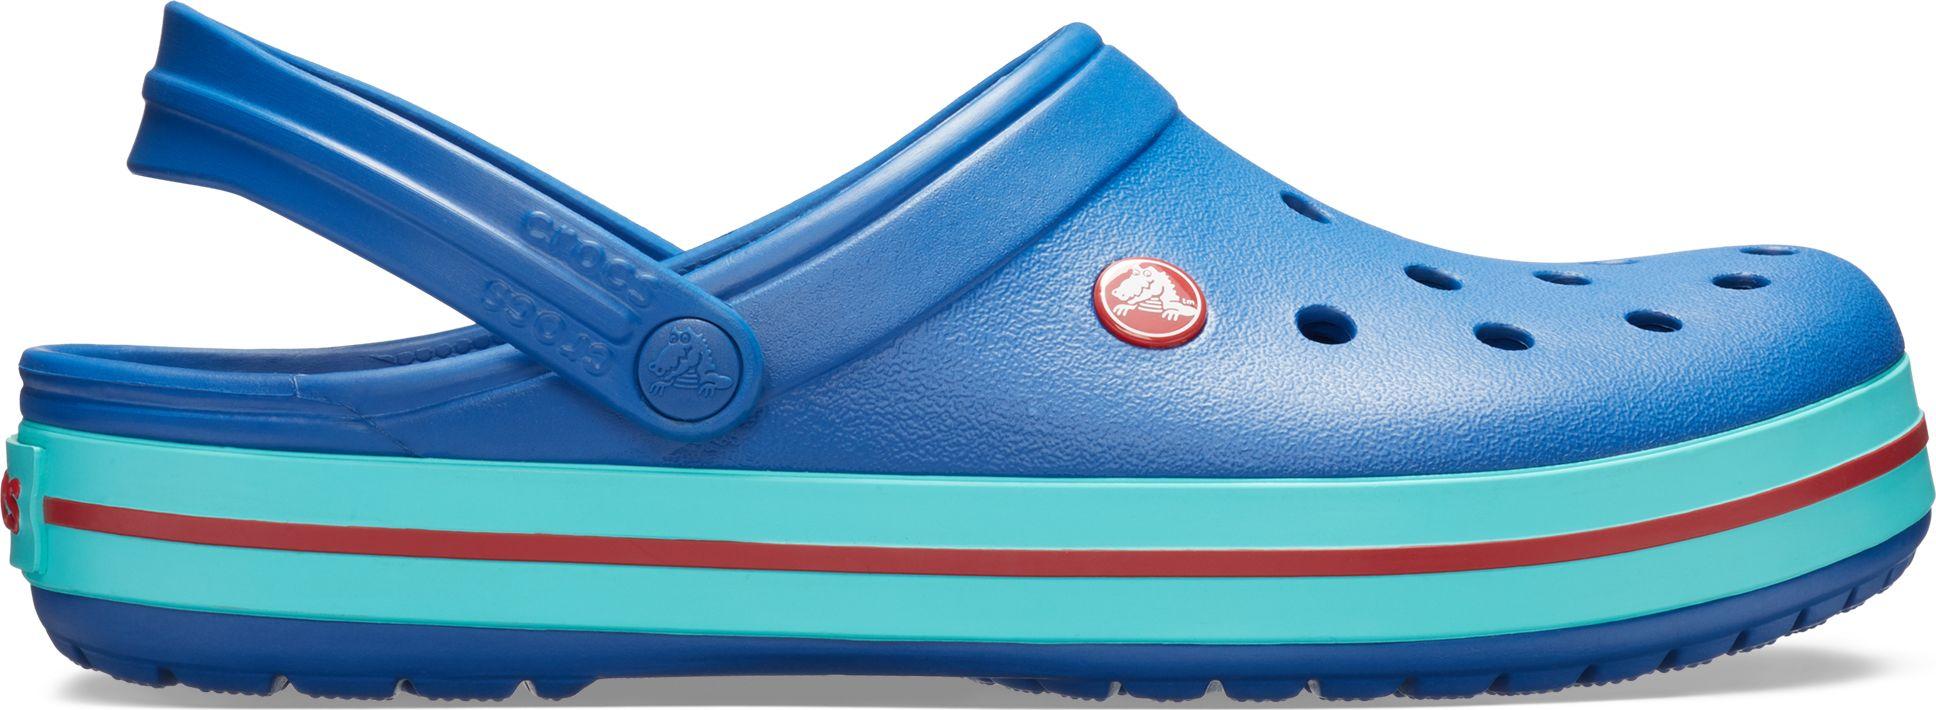 Crocs™ Crocband™ Blue Jean/Pool 41